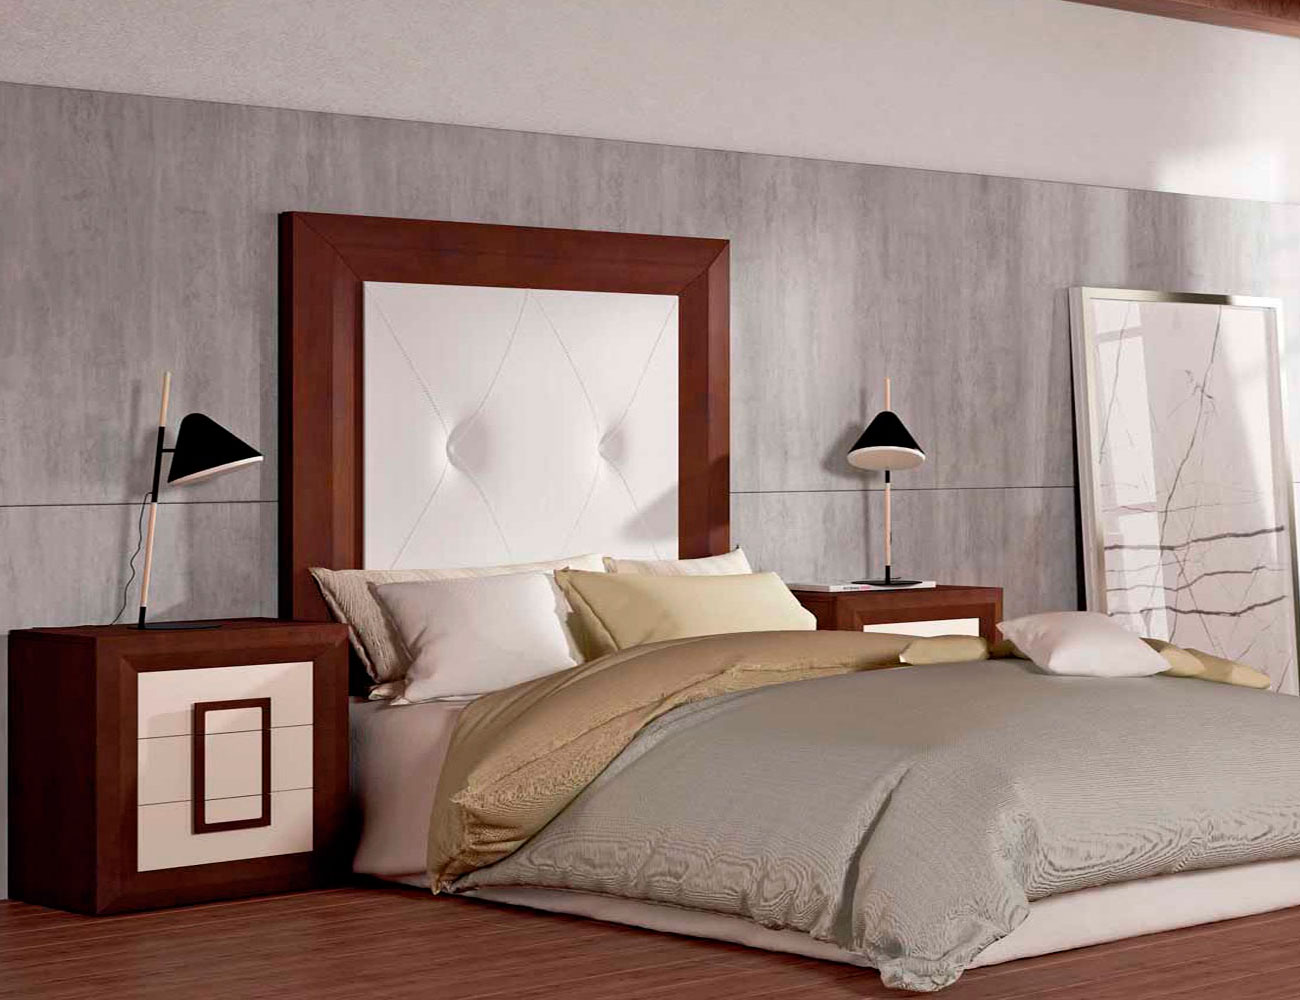 Muebles dormitorio matrimonio cabecero tapizado